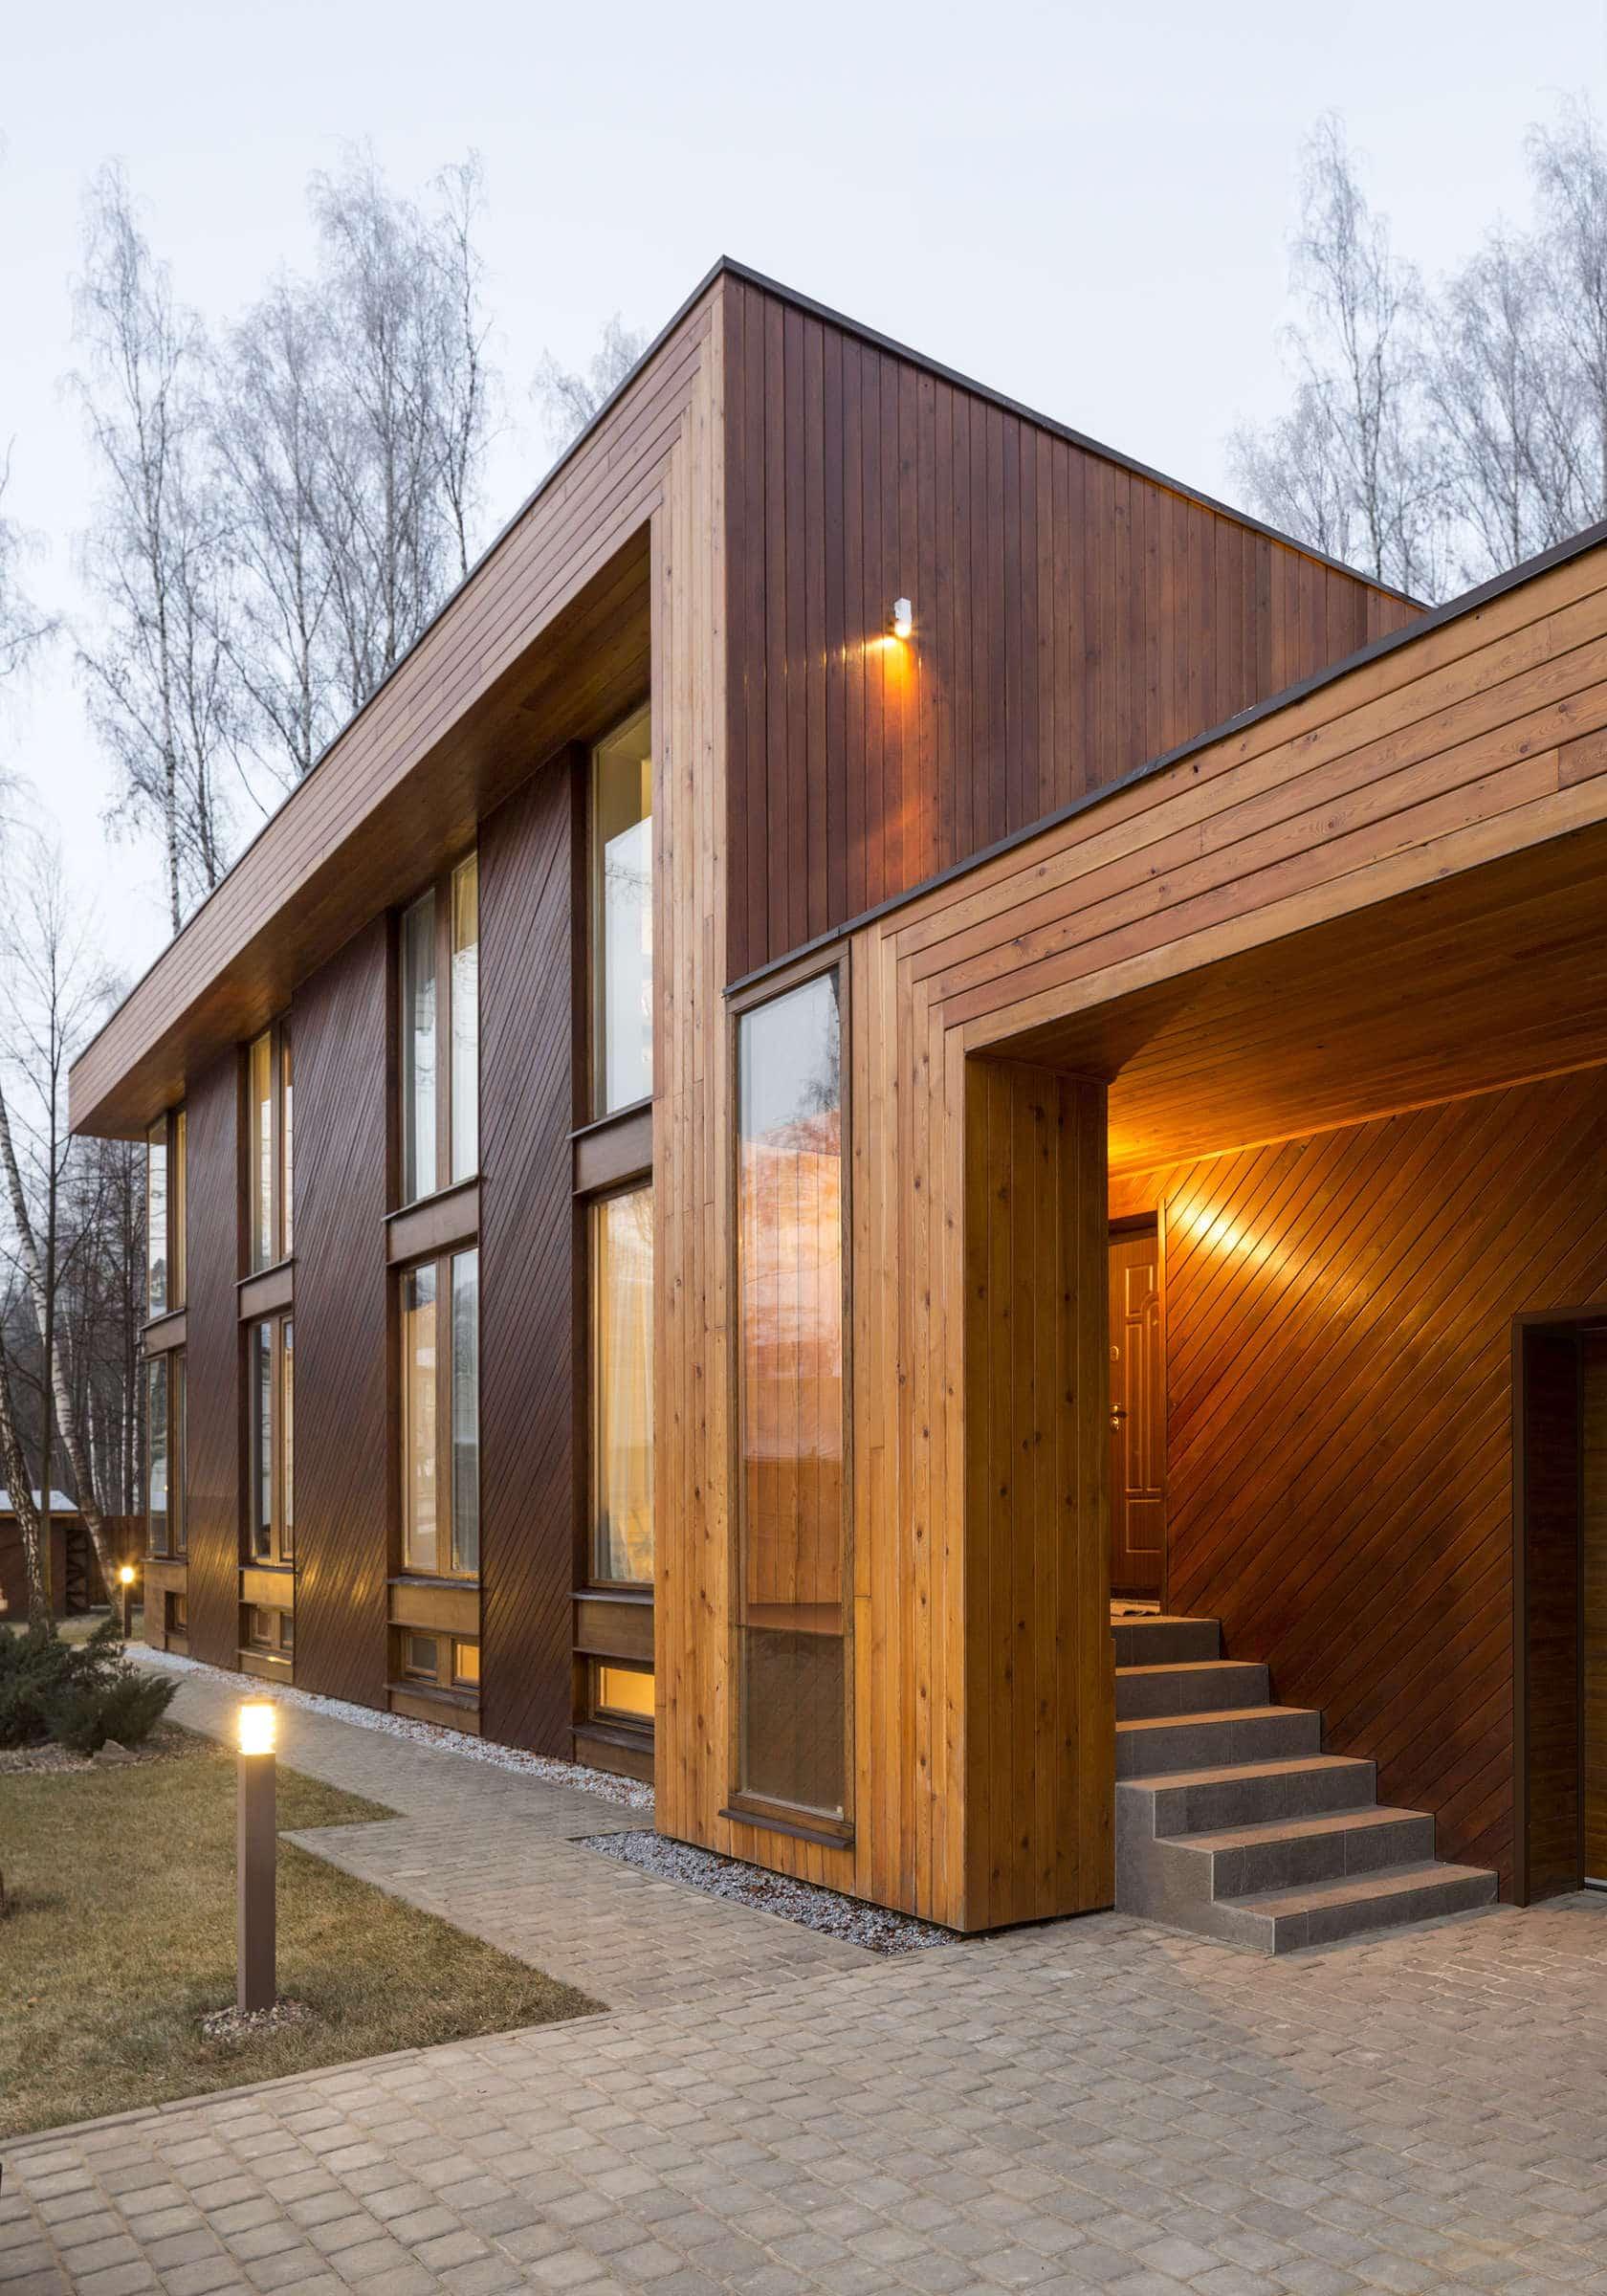 Dise o de casa de madera de dos pisos construye hogar - La casa de madera ...